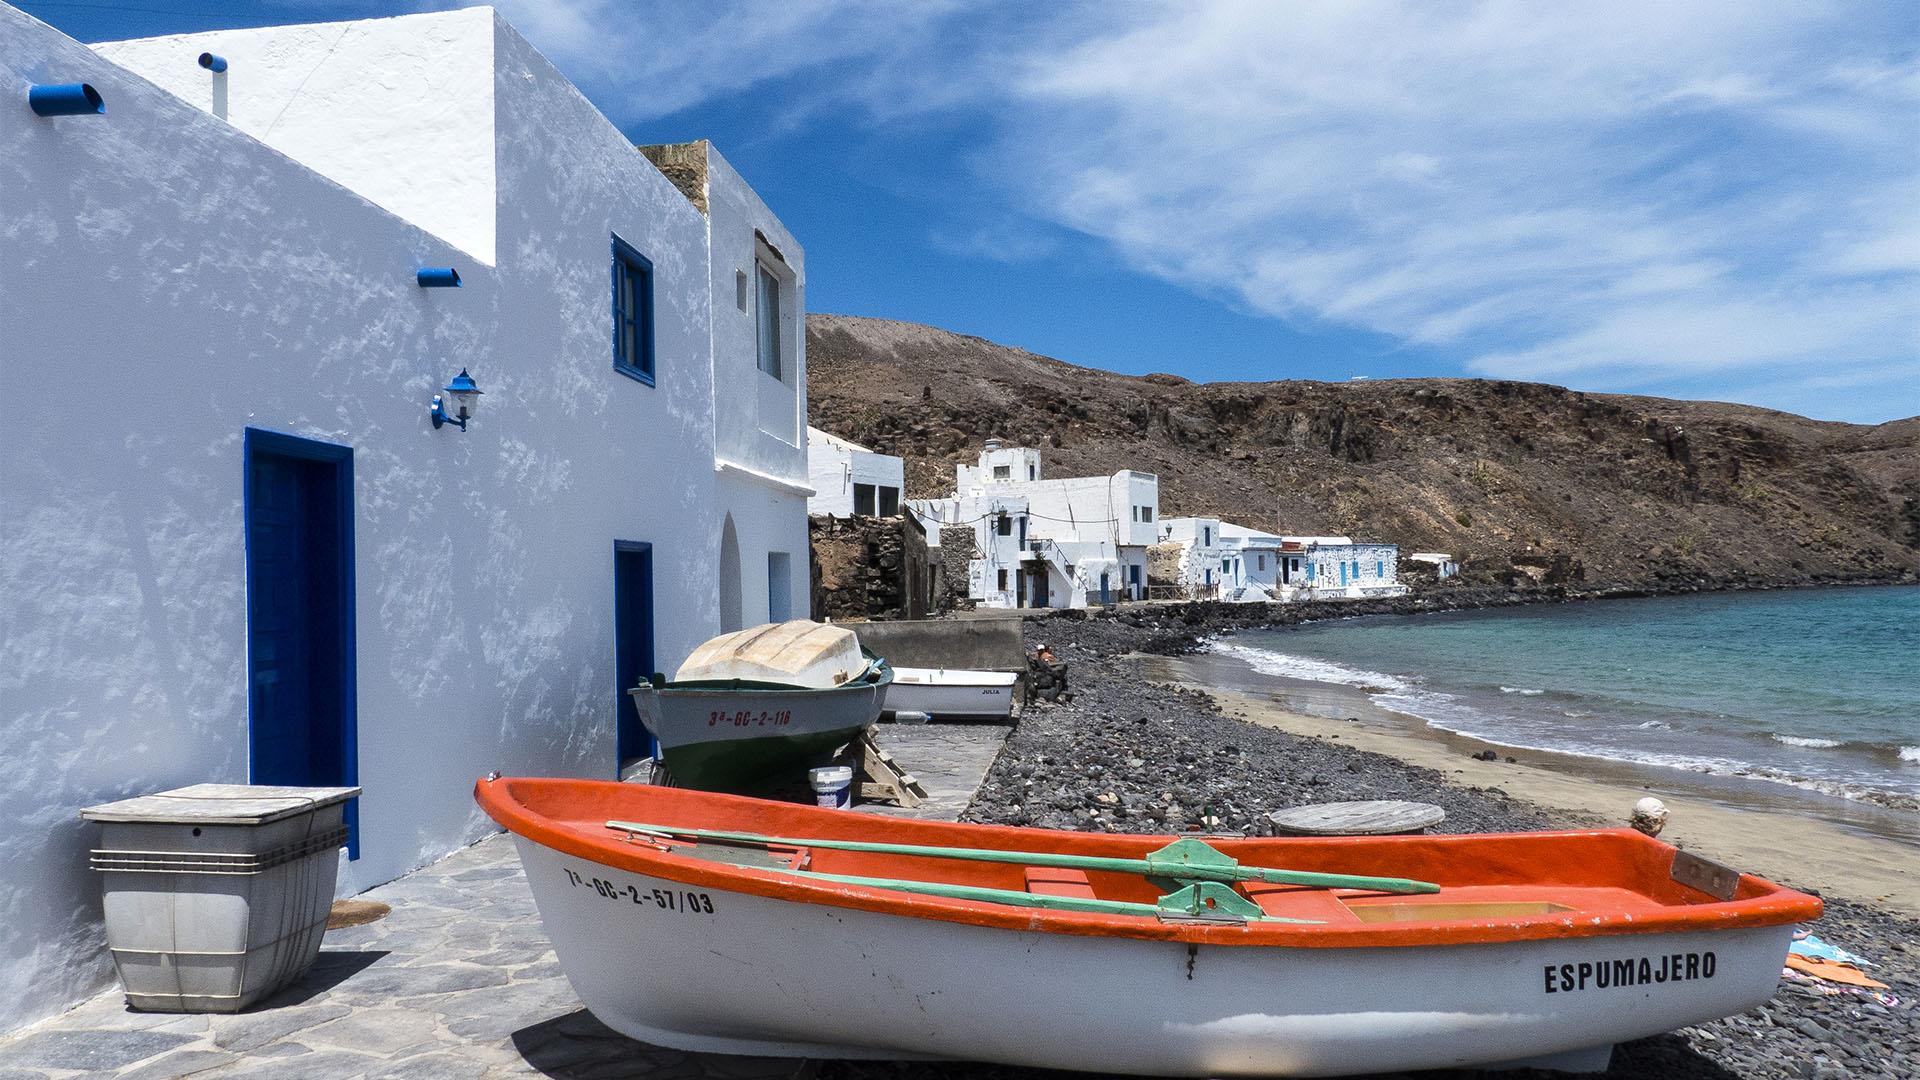 Die Strände Fuerteventuras: Playa de Pozo Negro